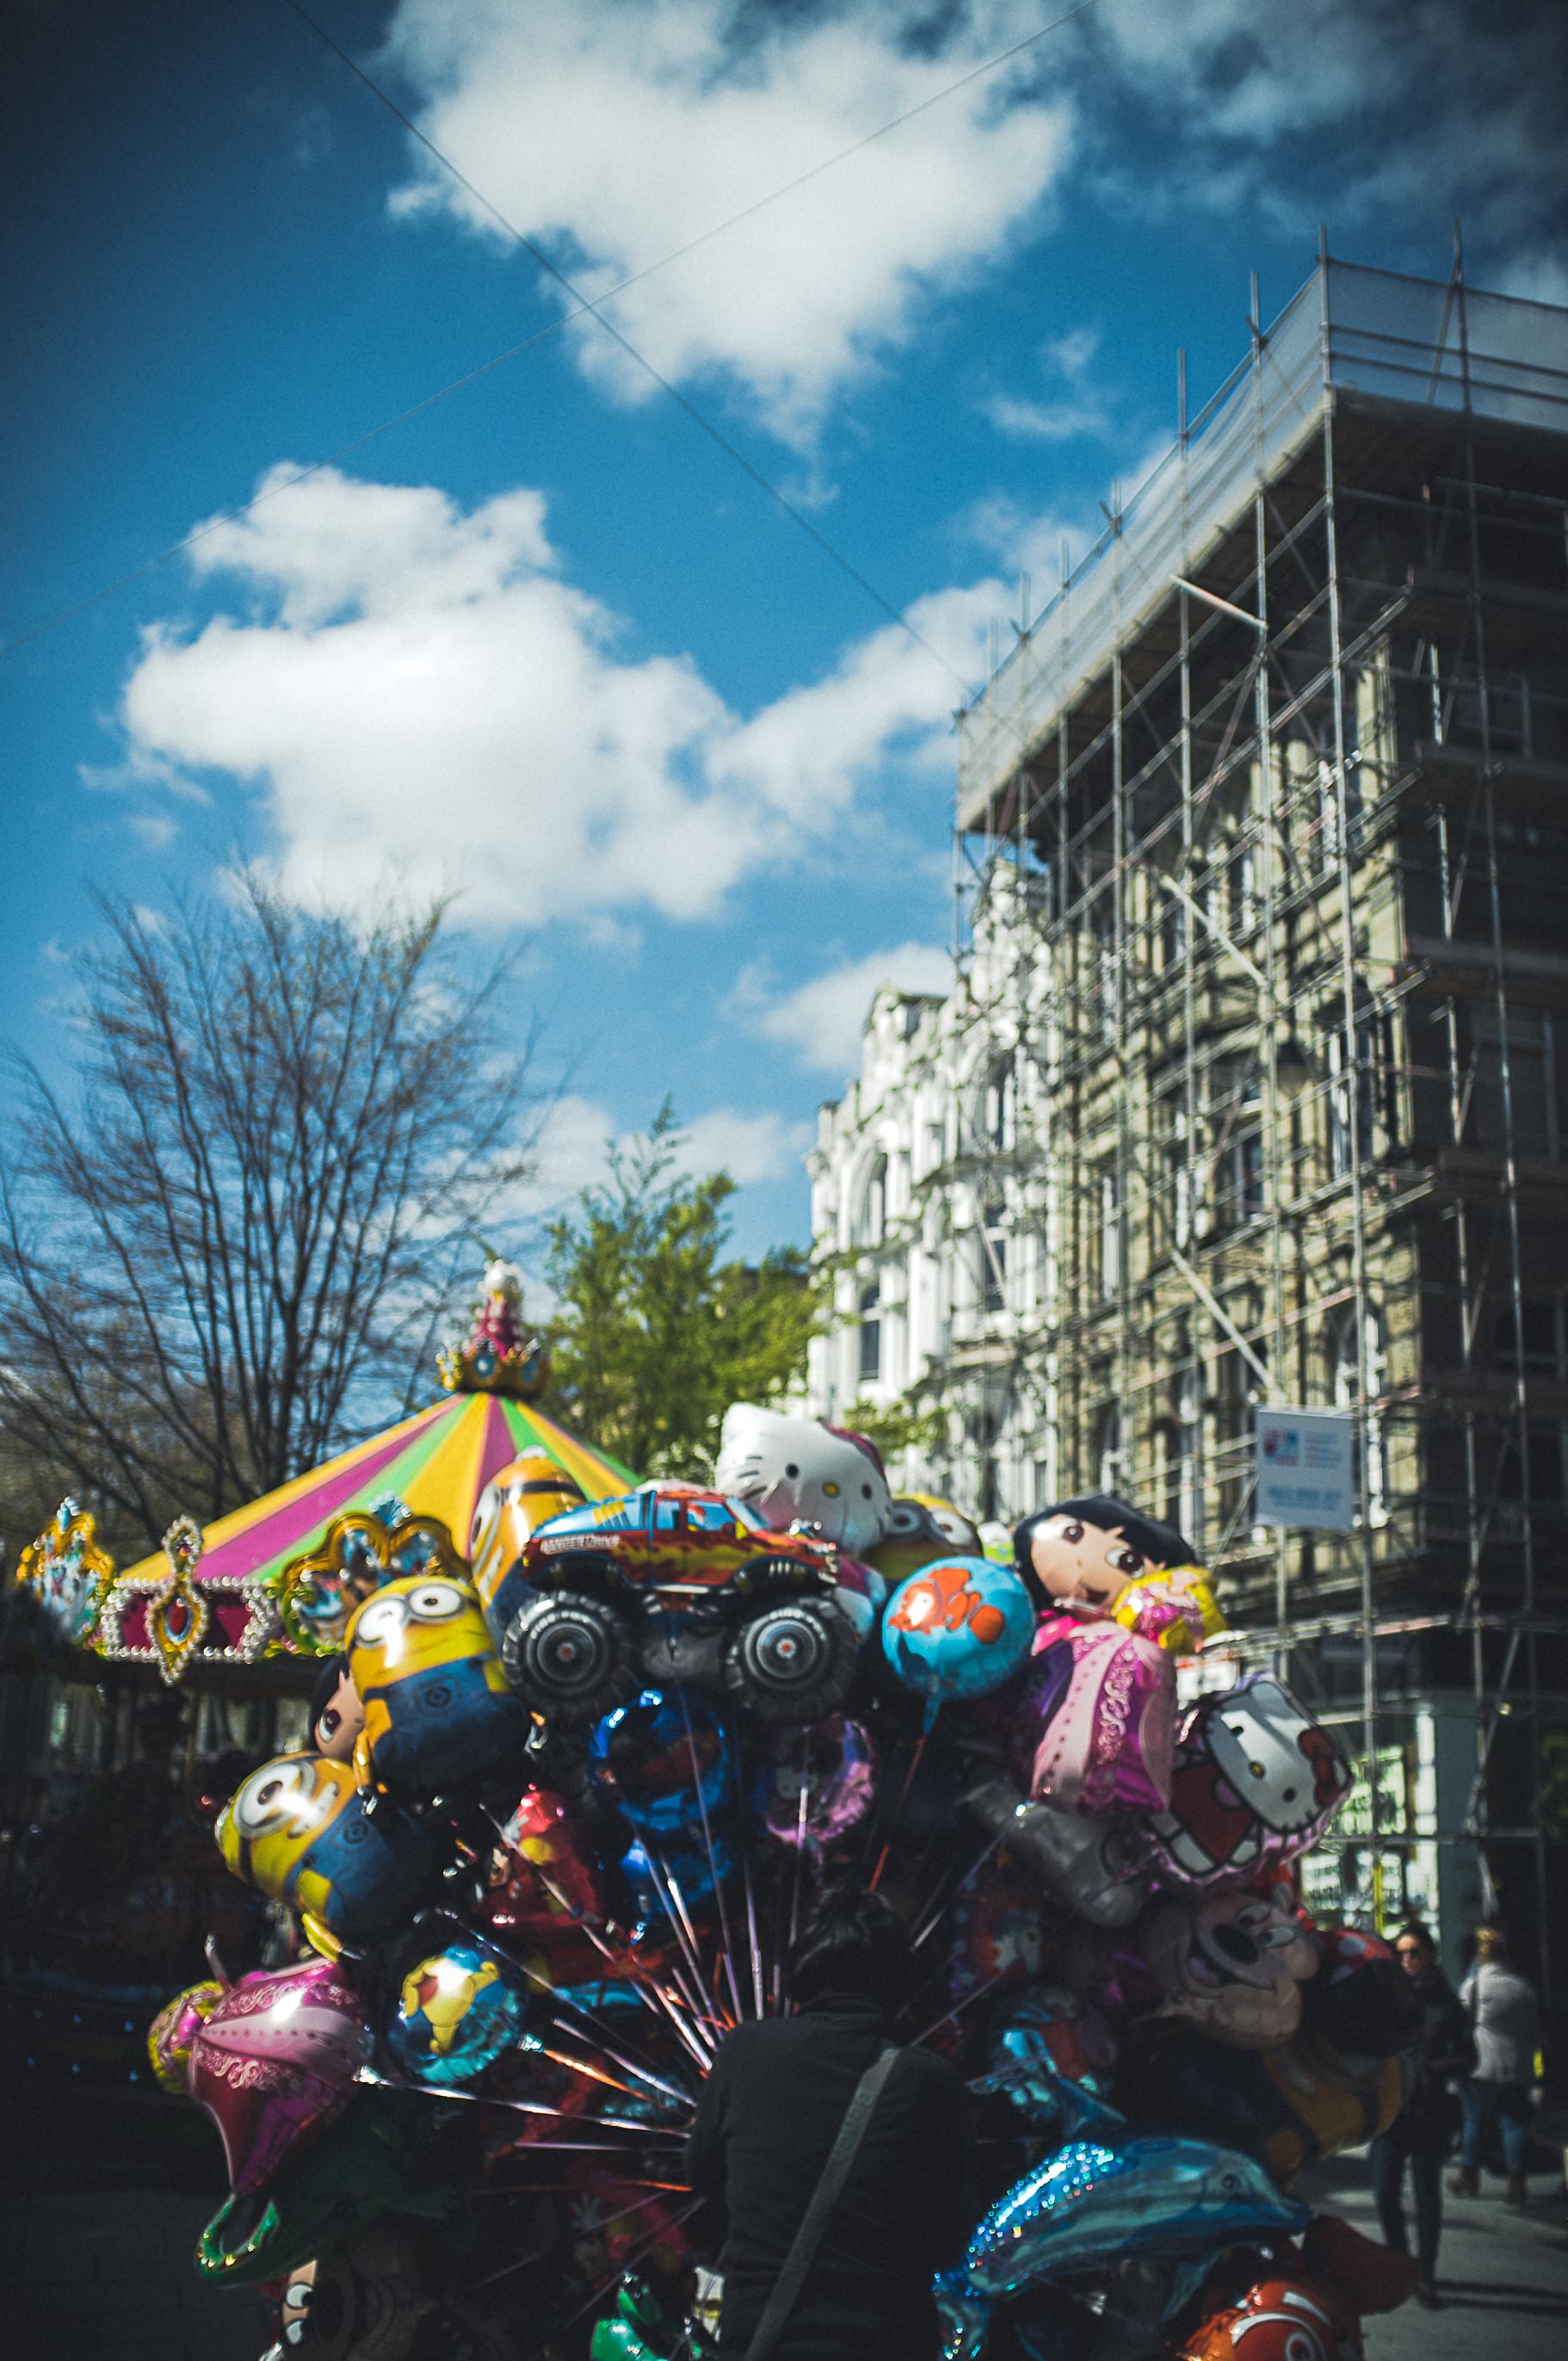 cardiff_street_photography_with_the_fuji_x100-4.jpg